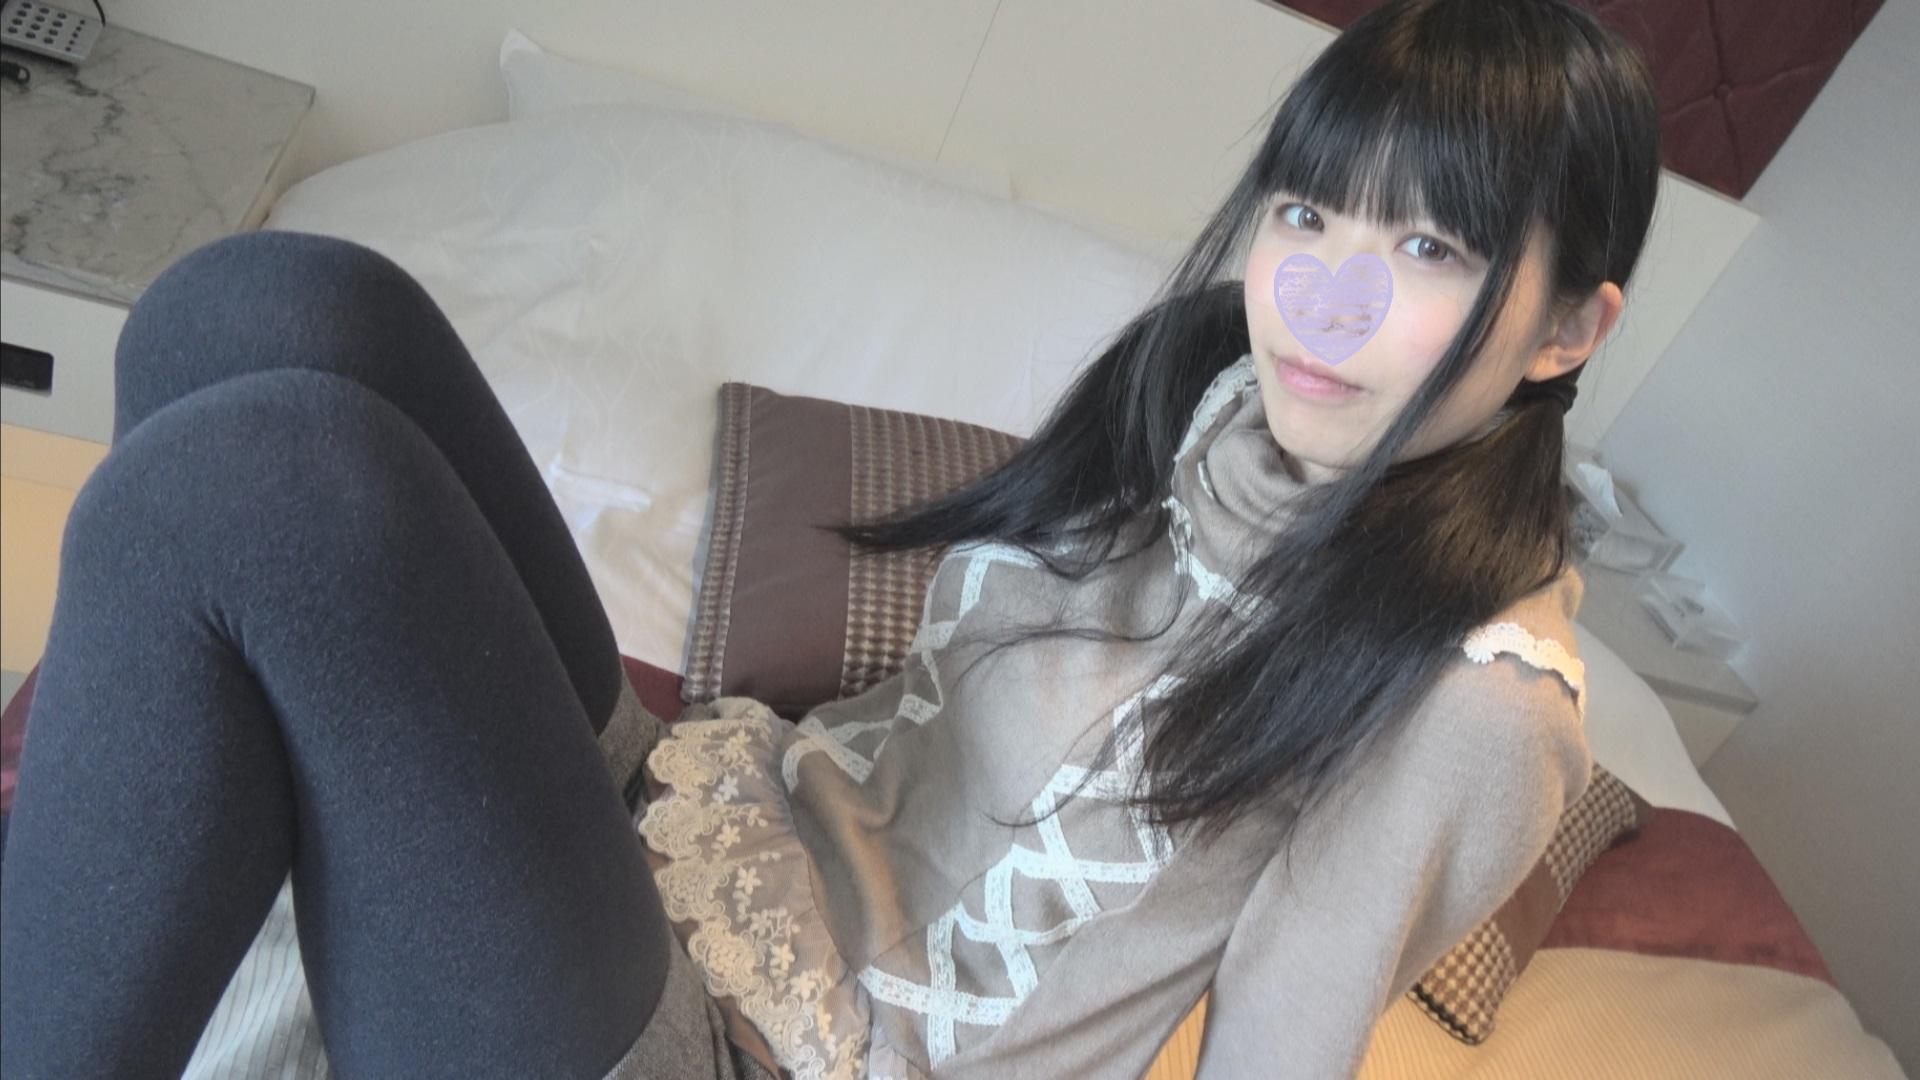 FC2 PPV 863415 shooting Sayoko 25-year-old black hair twin tail tall slender beautiful married woman